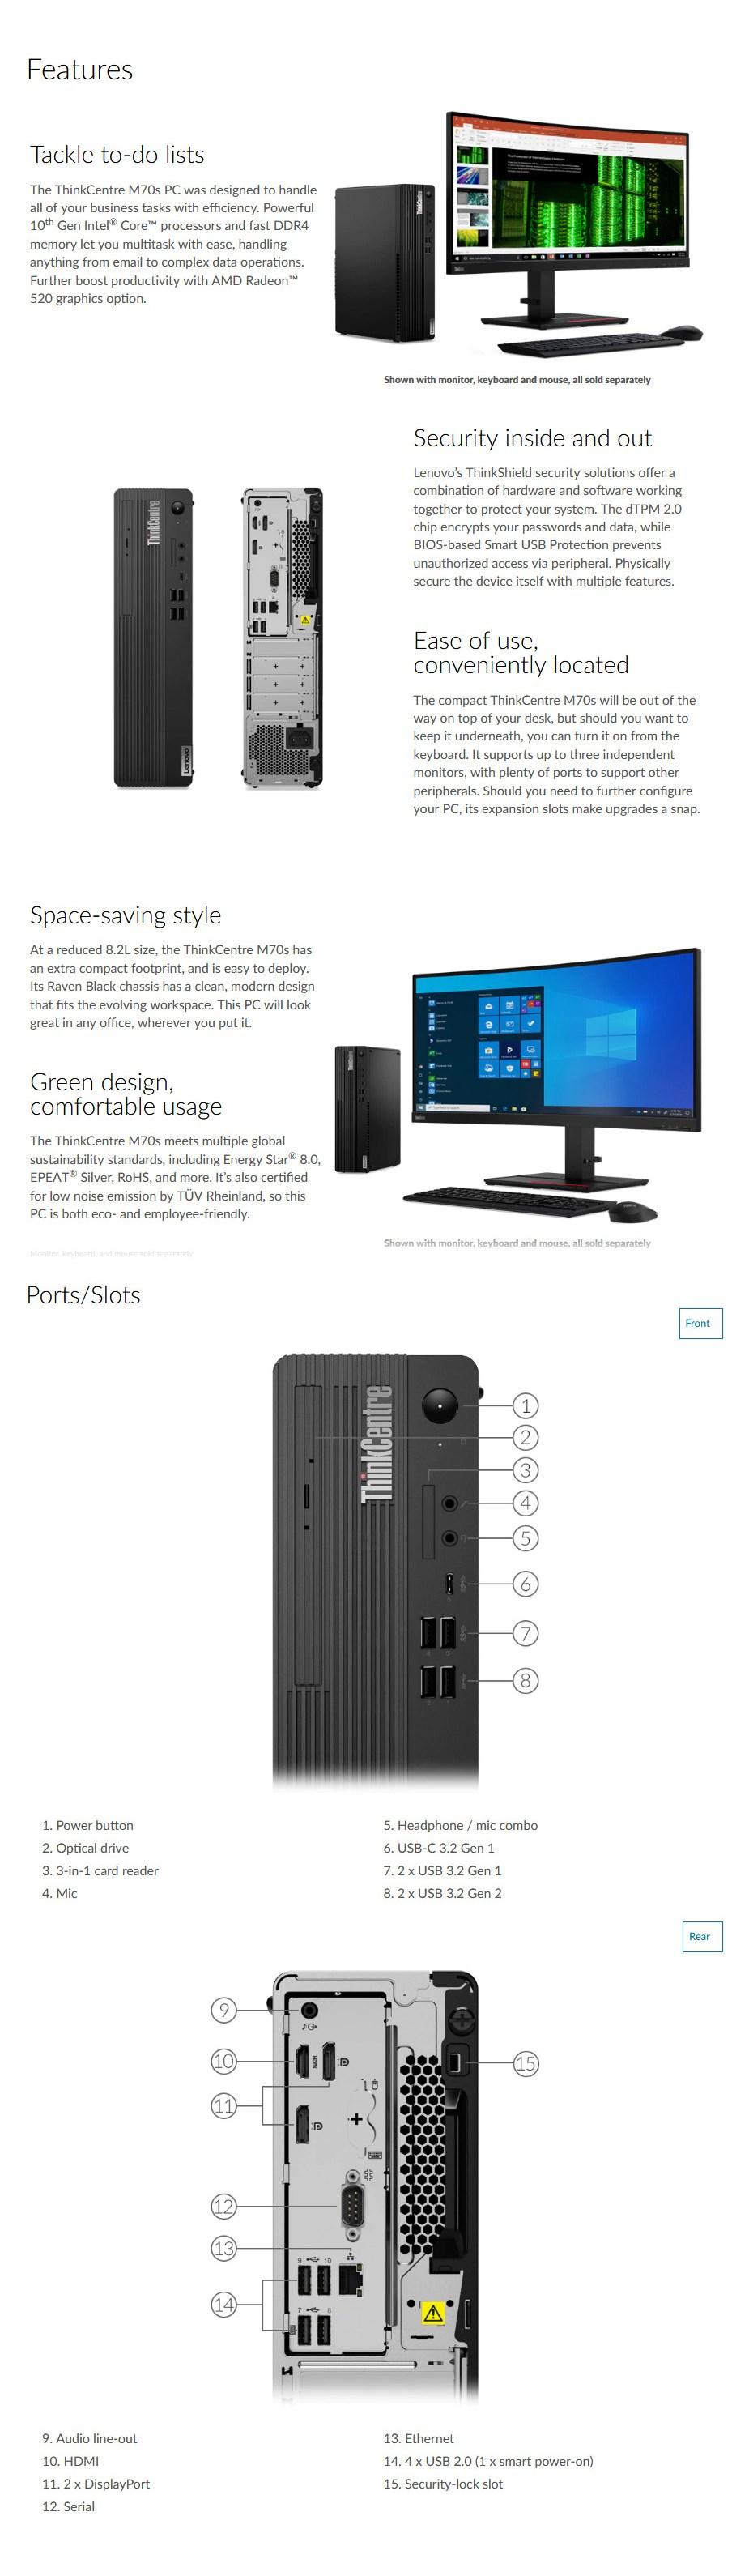 lenovo-m70s-sff-desktop-i510400-8gb-256gb-windows-10-pro-ac41107-5-1-.jpg